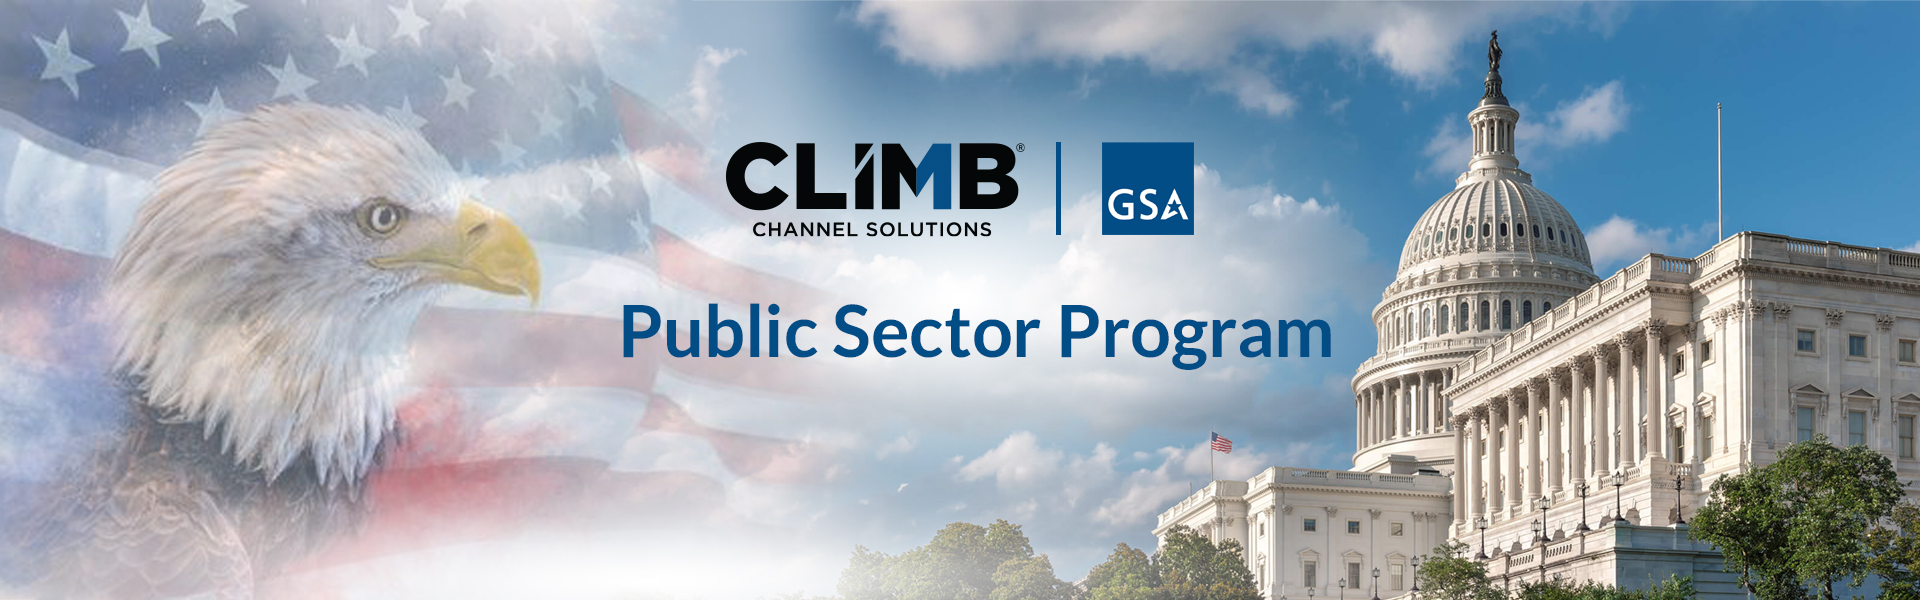 Climb Public Sector Banner